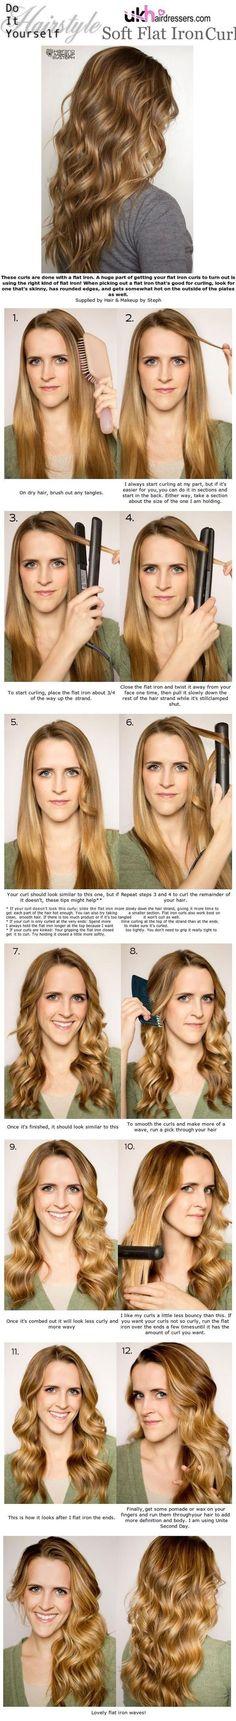 15 Hair Tricks Created by Hair Straightener